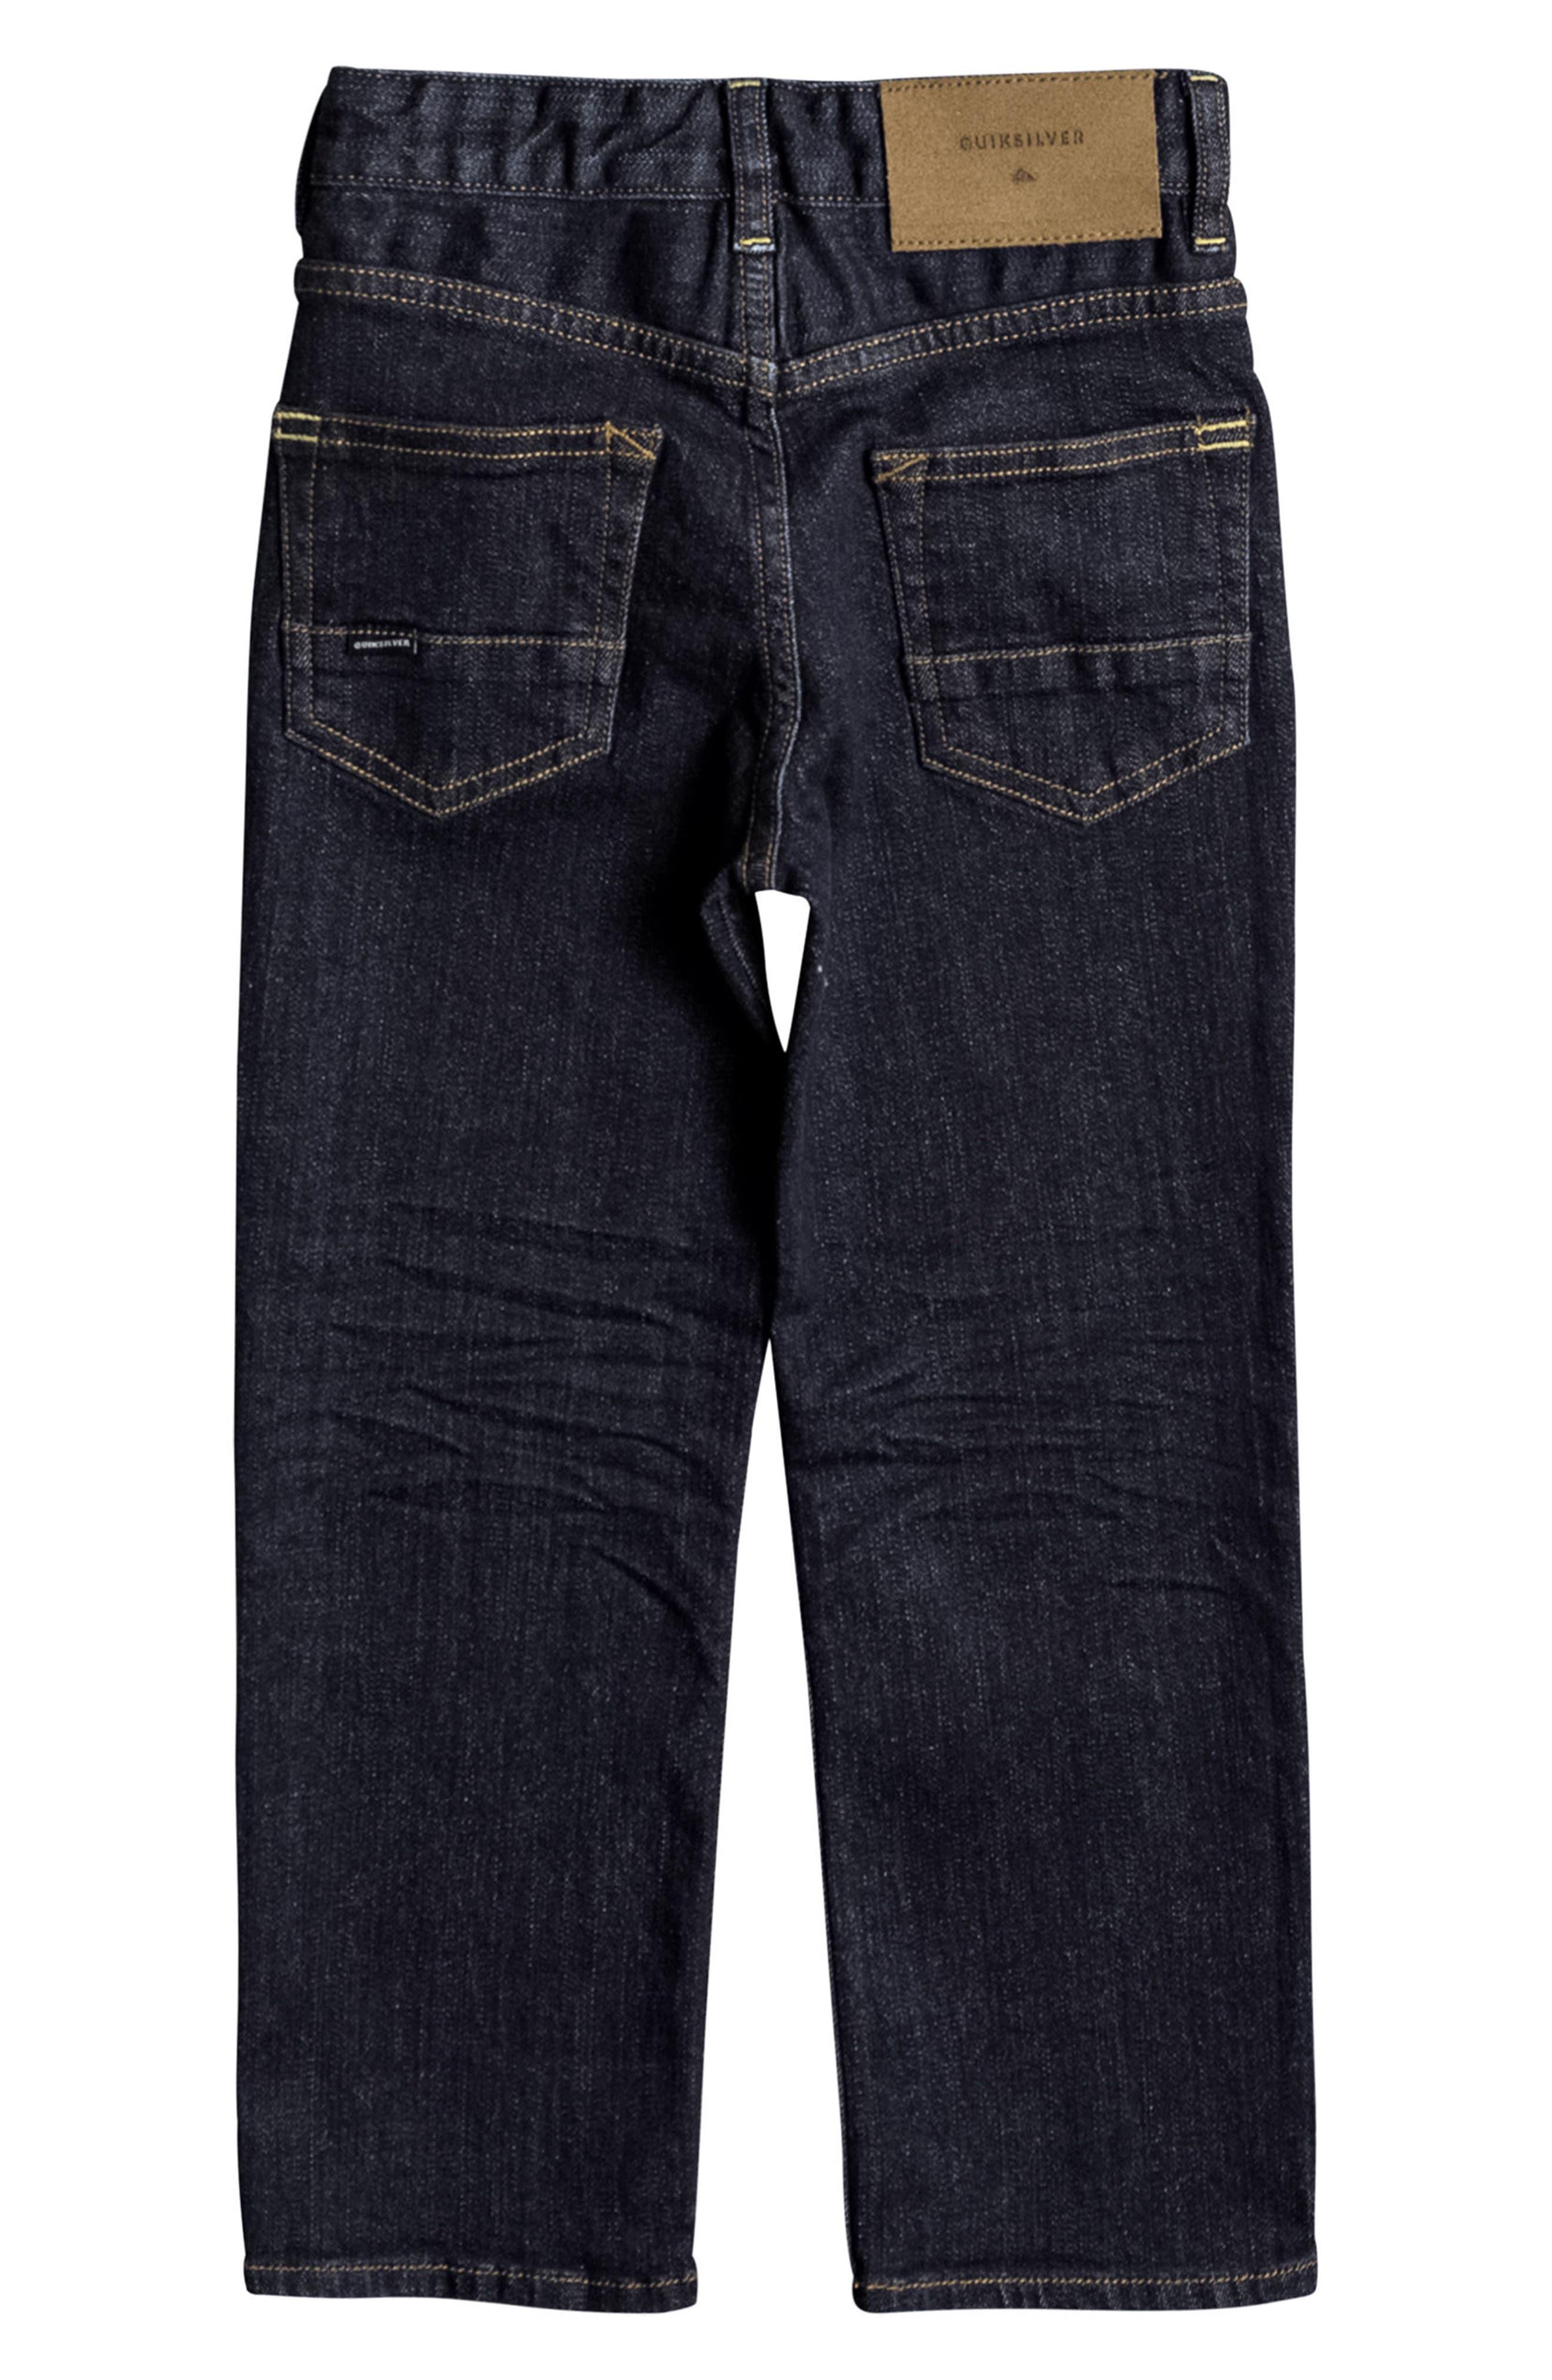 Alternate Image 2  - Quiksilver Sequel Rinse Jeans (Toddler Boys & Little Boys)